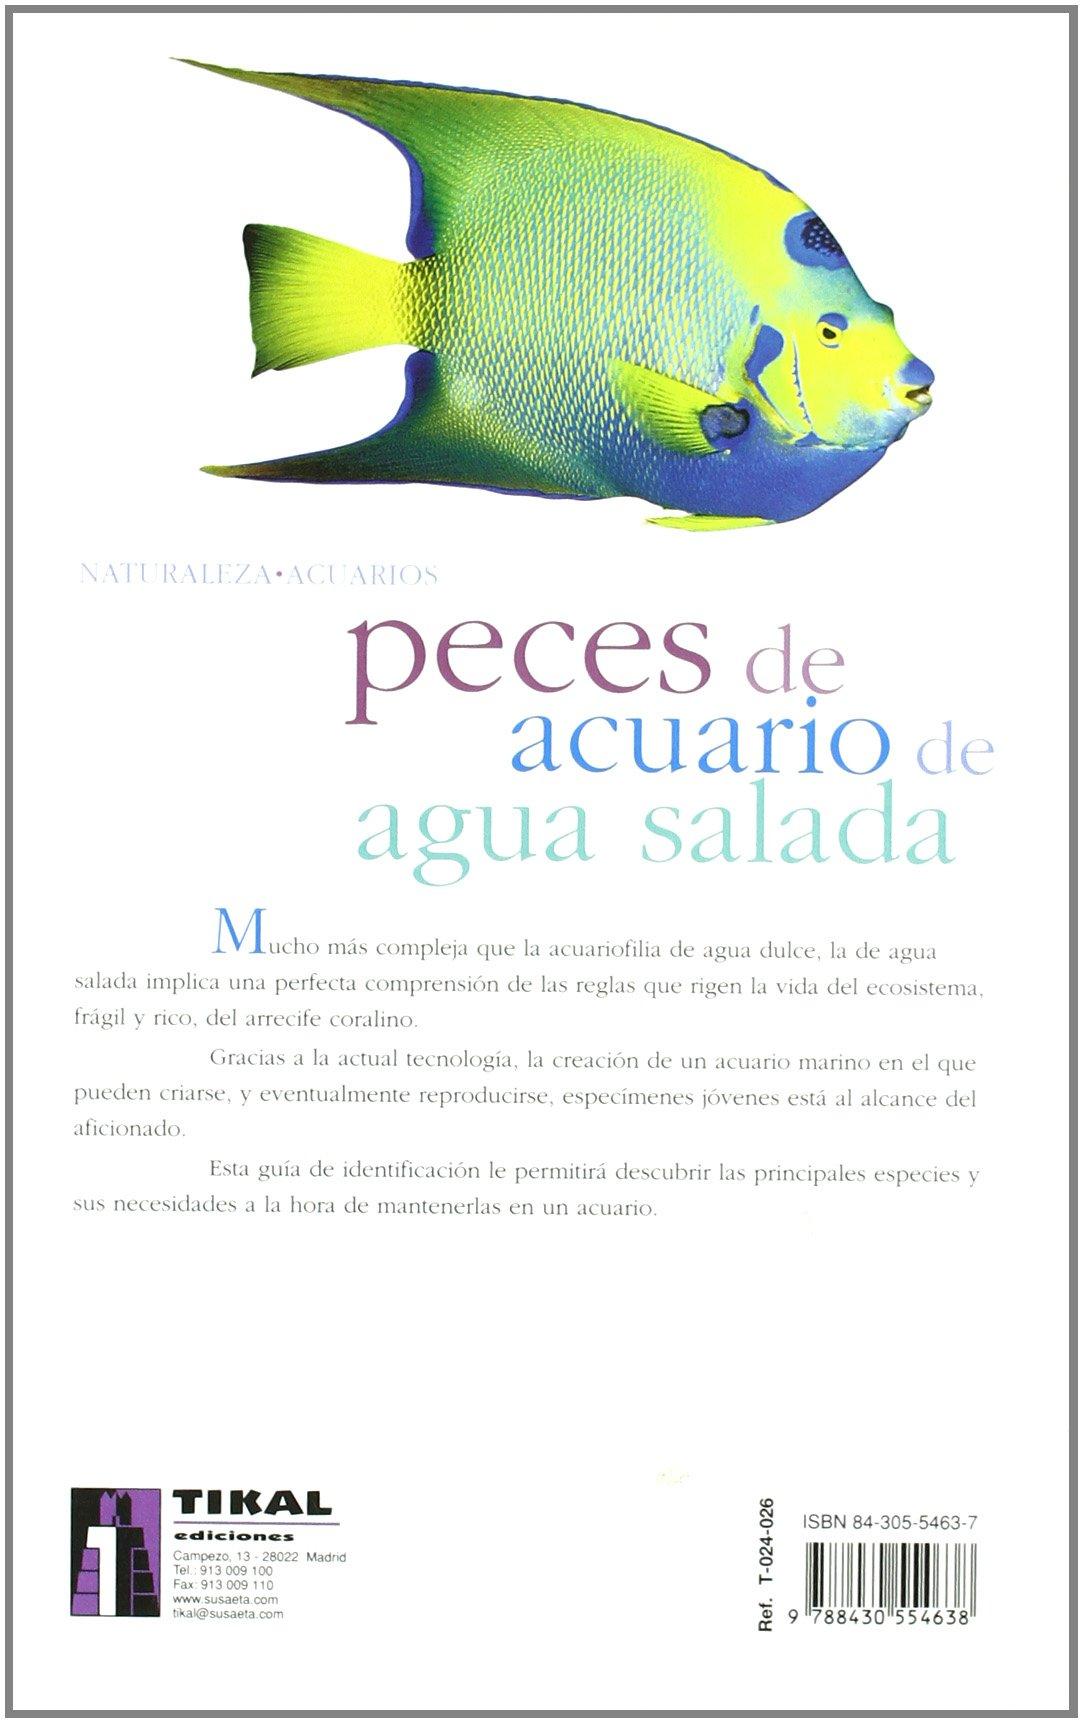 Peces de acuario de agua salada: Losange: 9788430554638: Amazon.com: Books